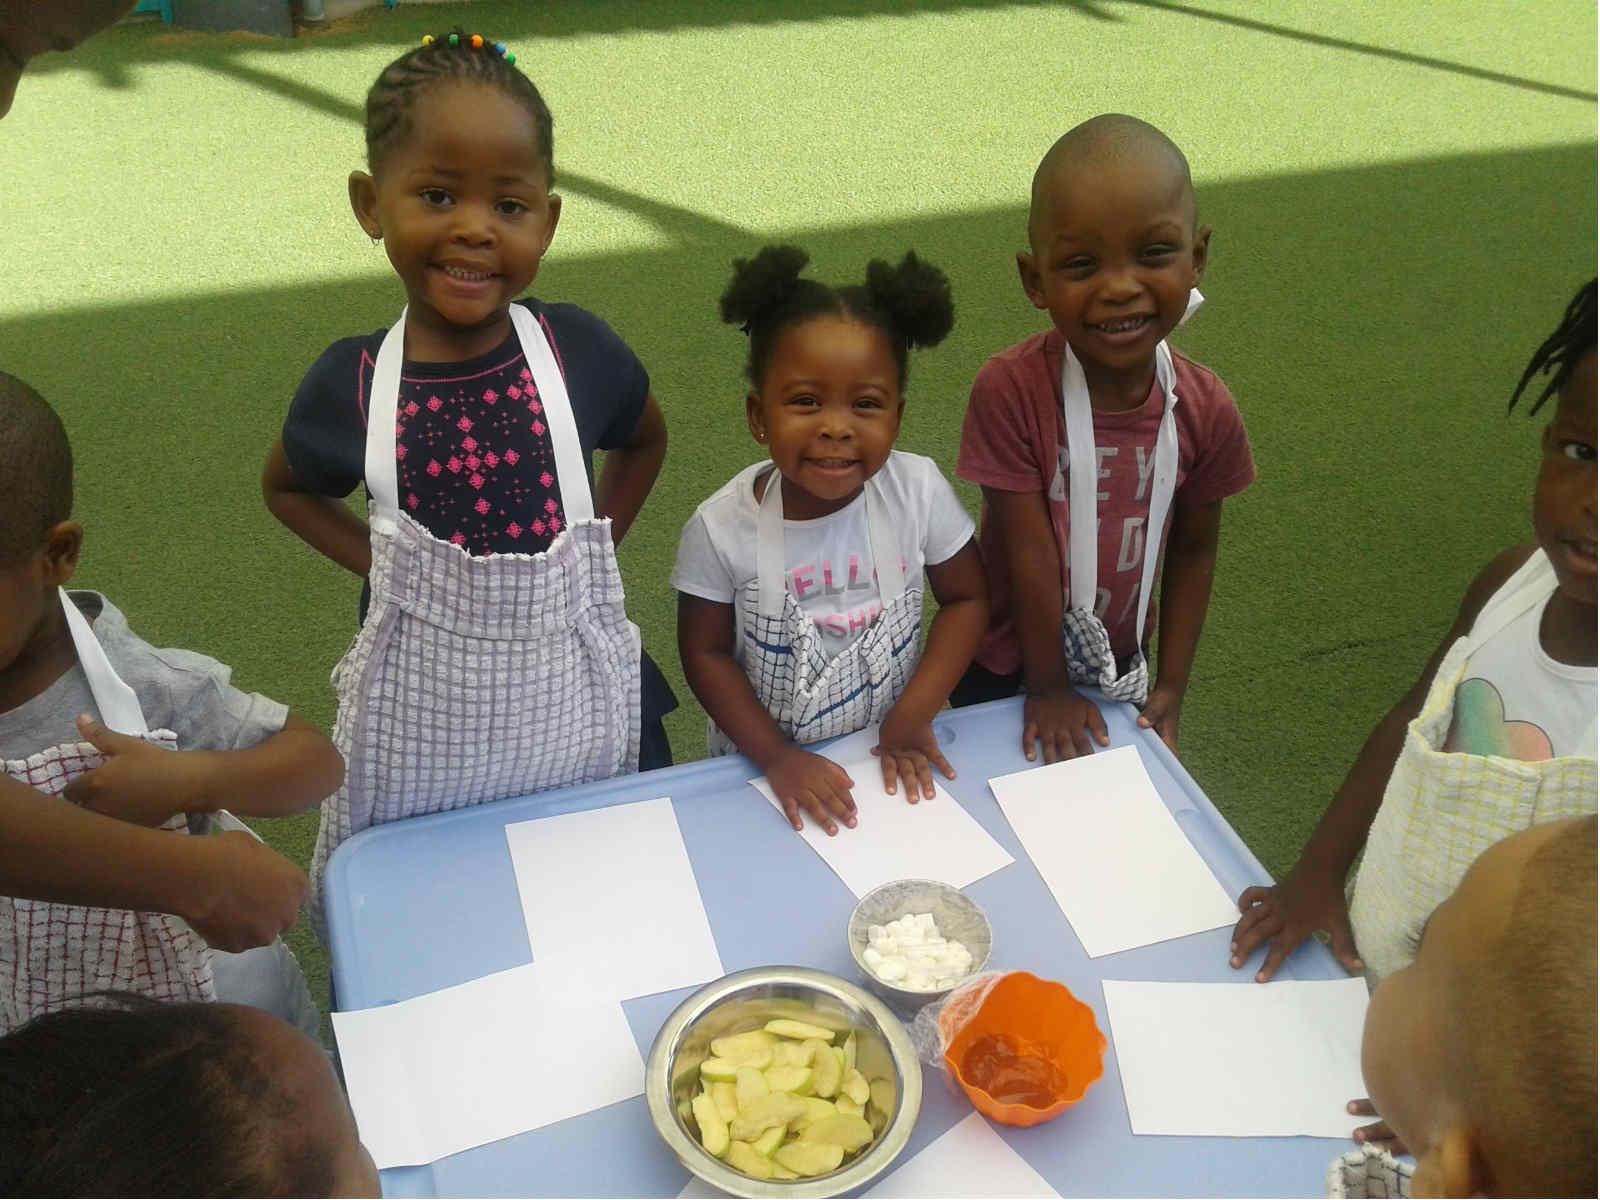 Brookhills Montessori School